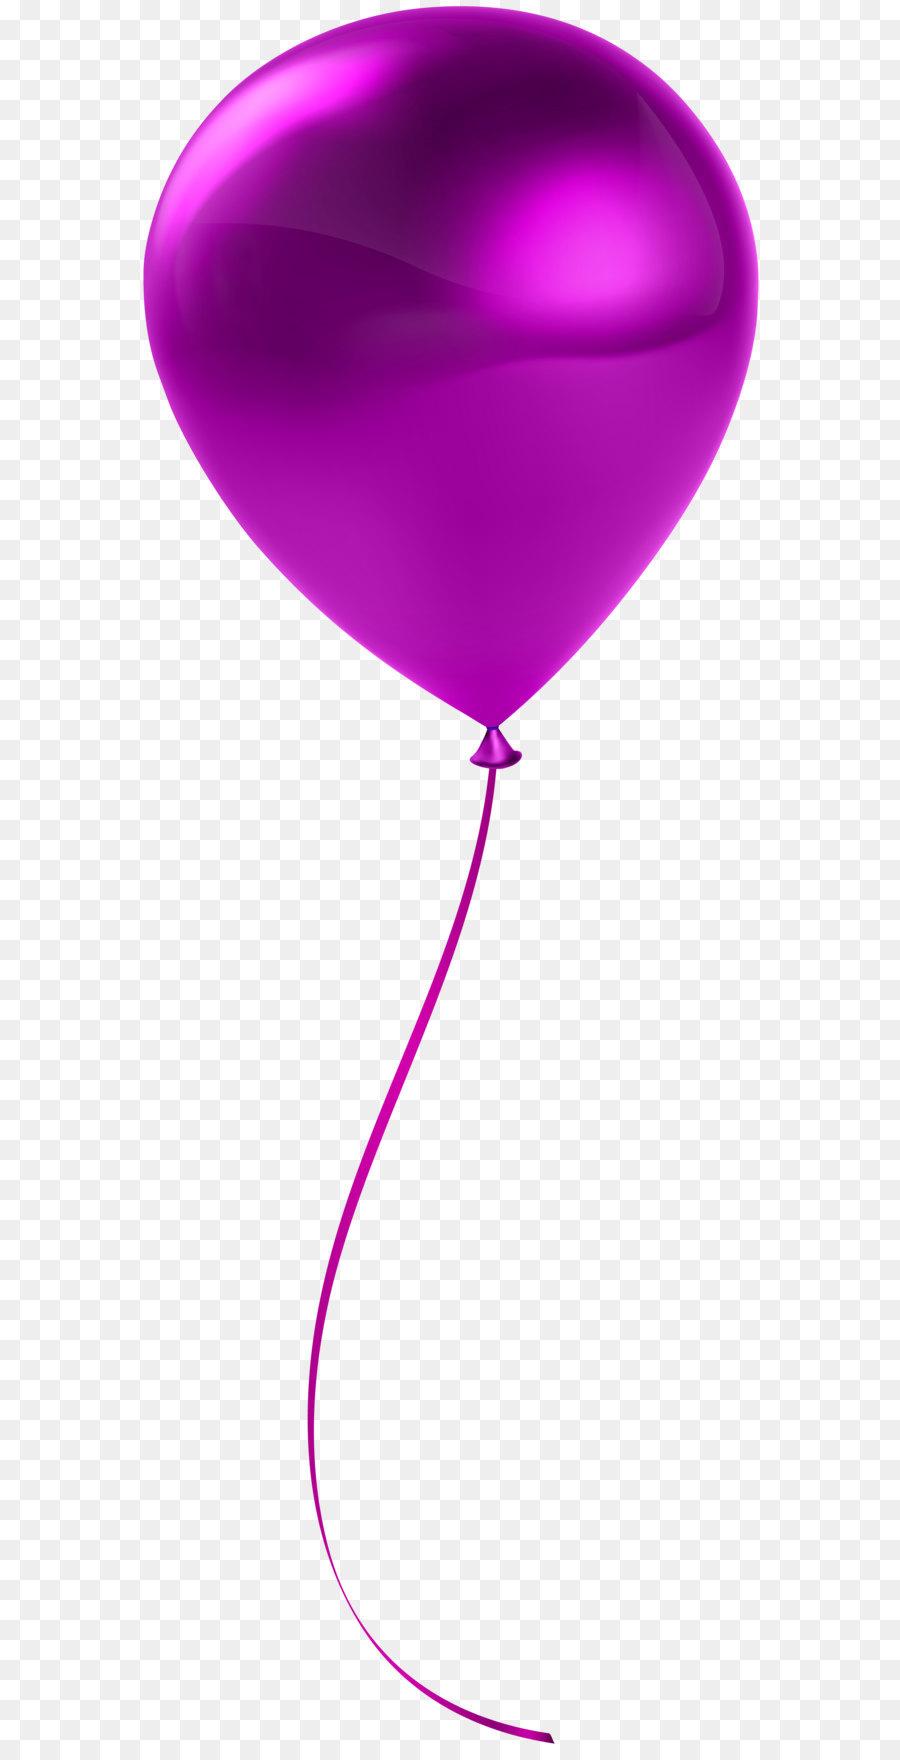 Font transparent clip art. Balloon clipart single